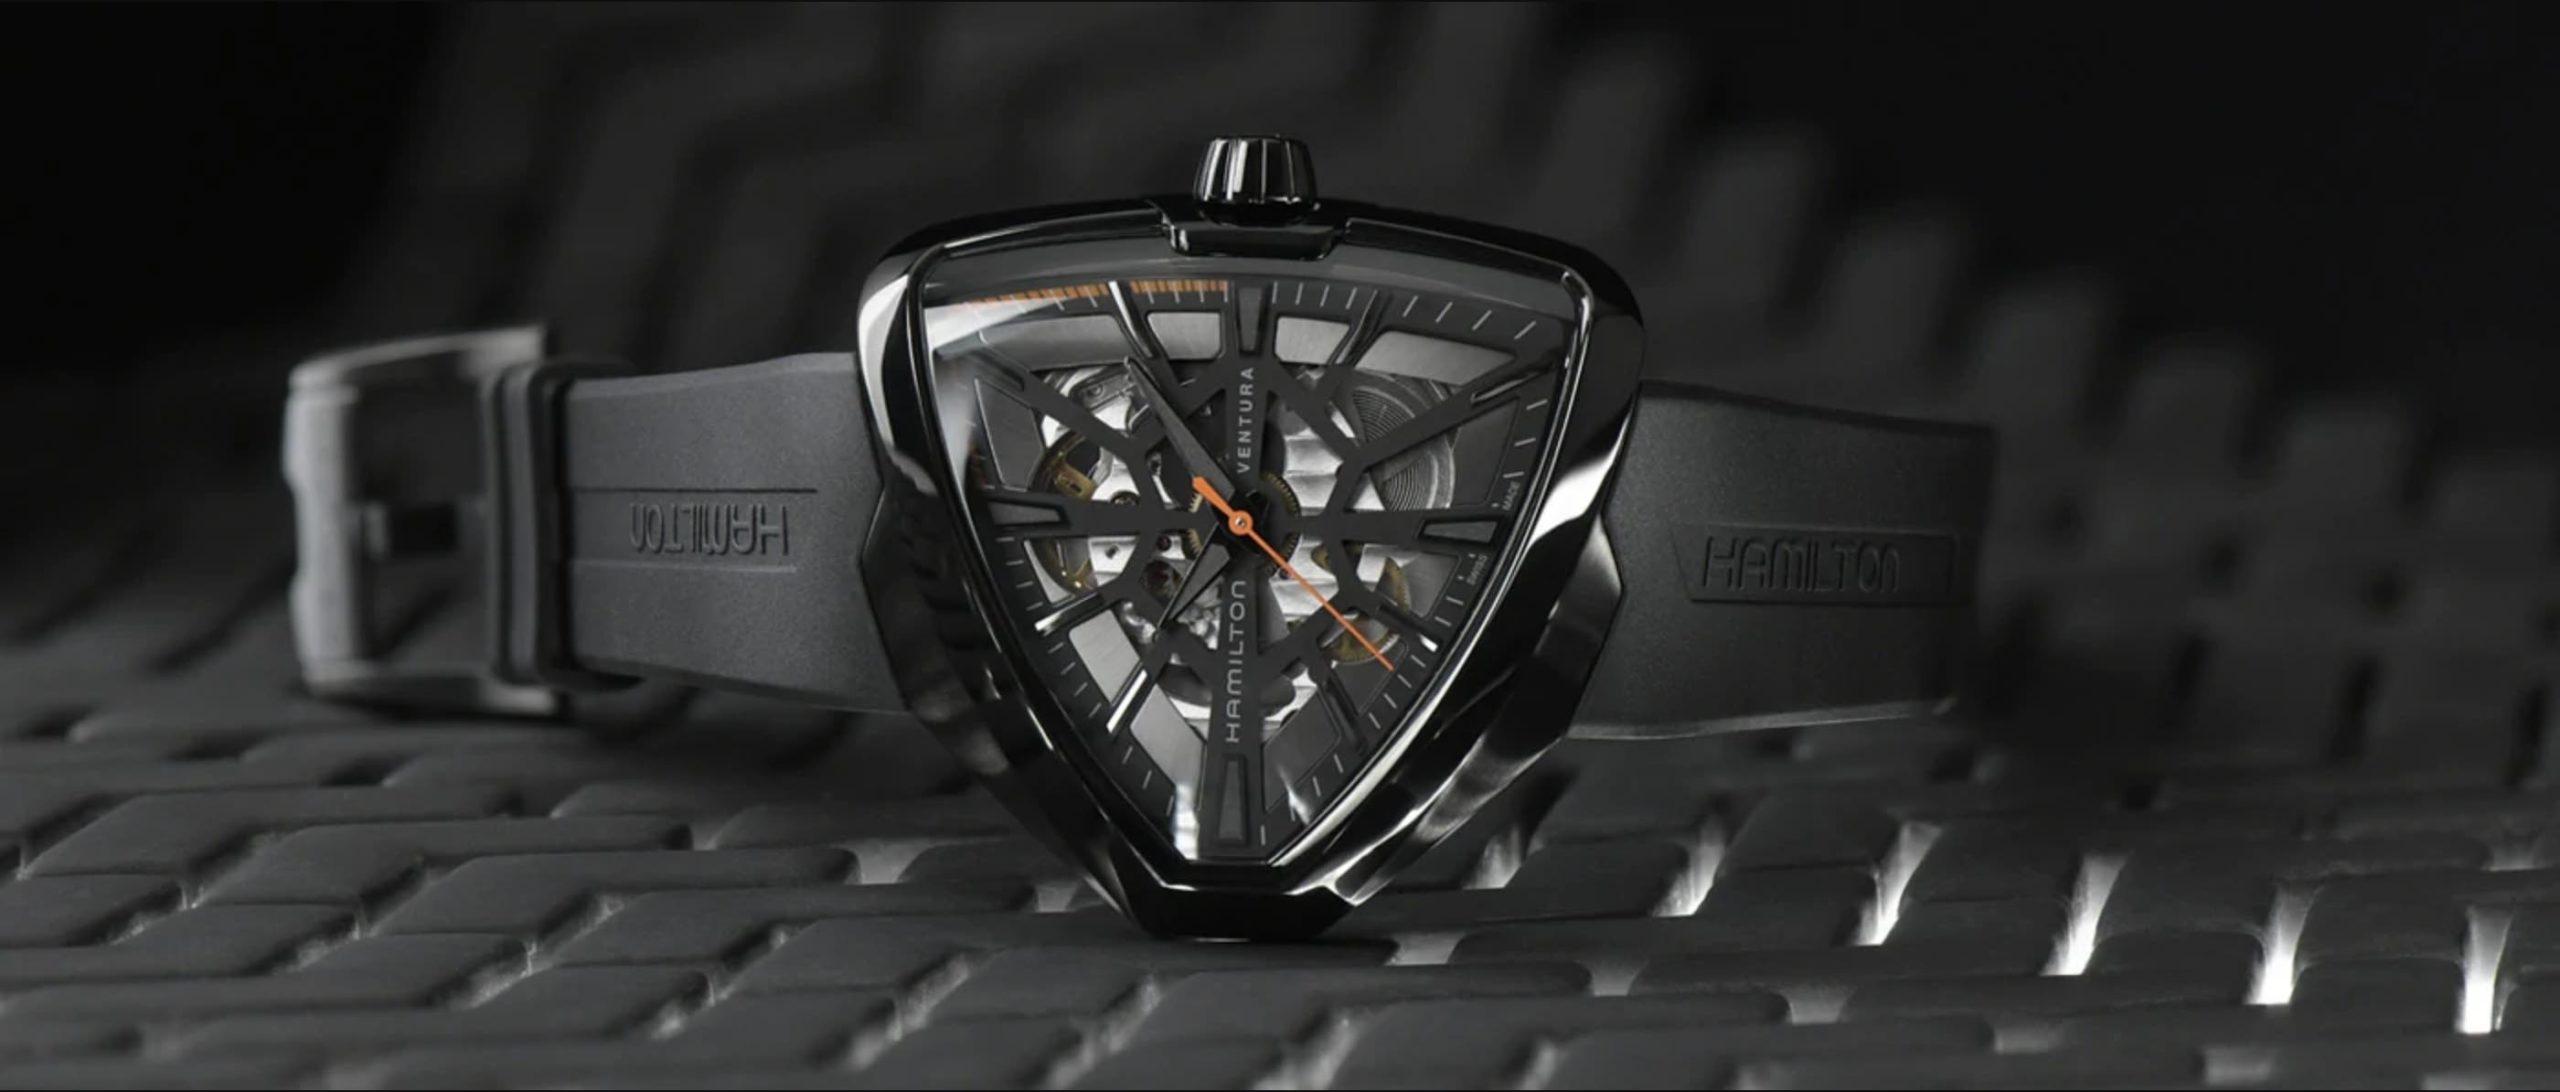 Hamilton-watches-authorized-dealer